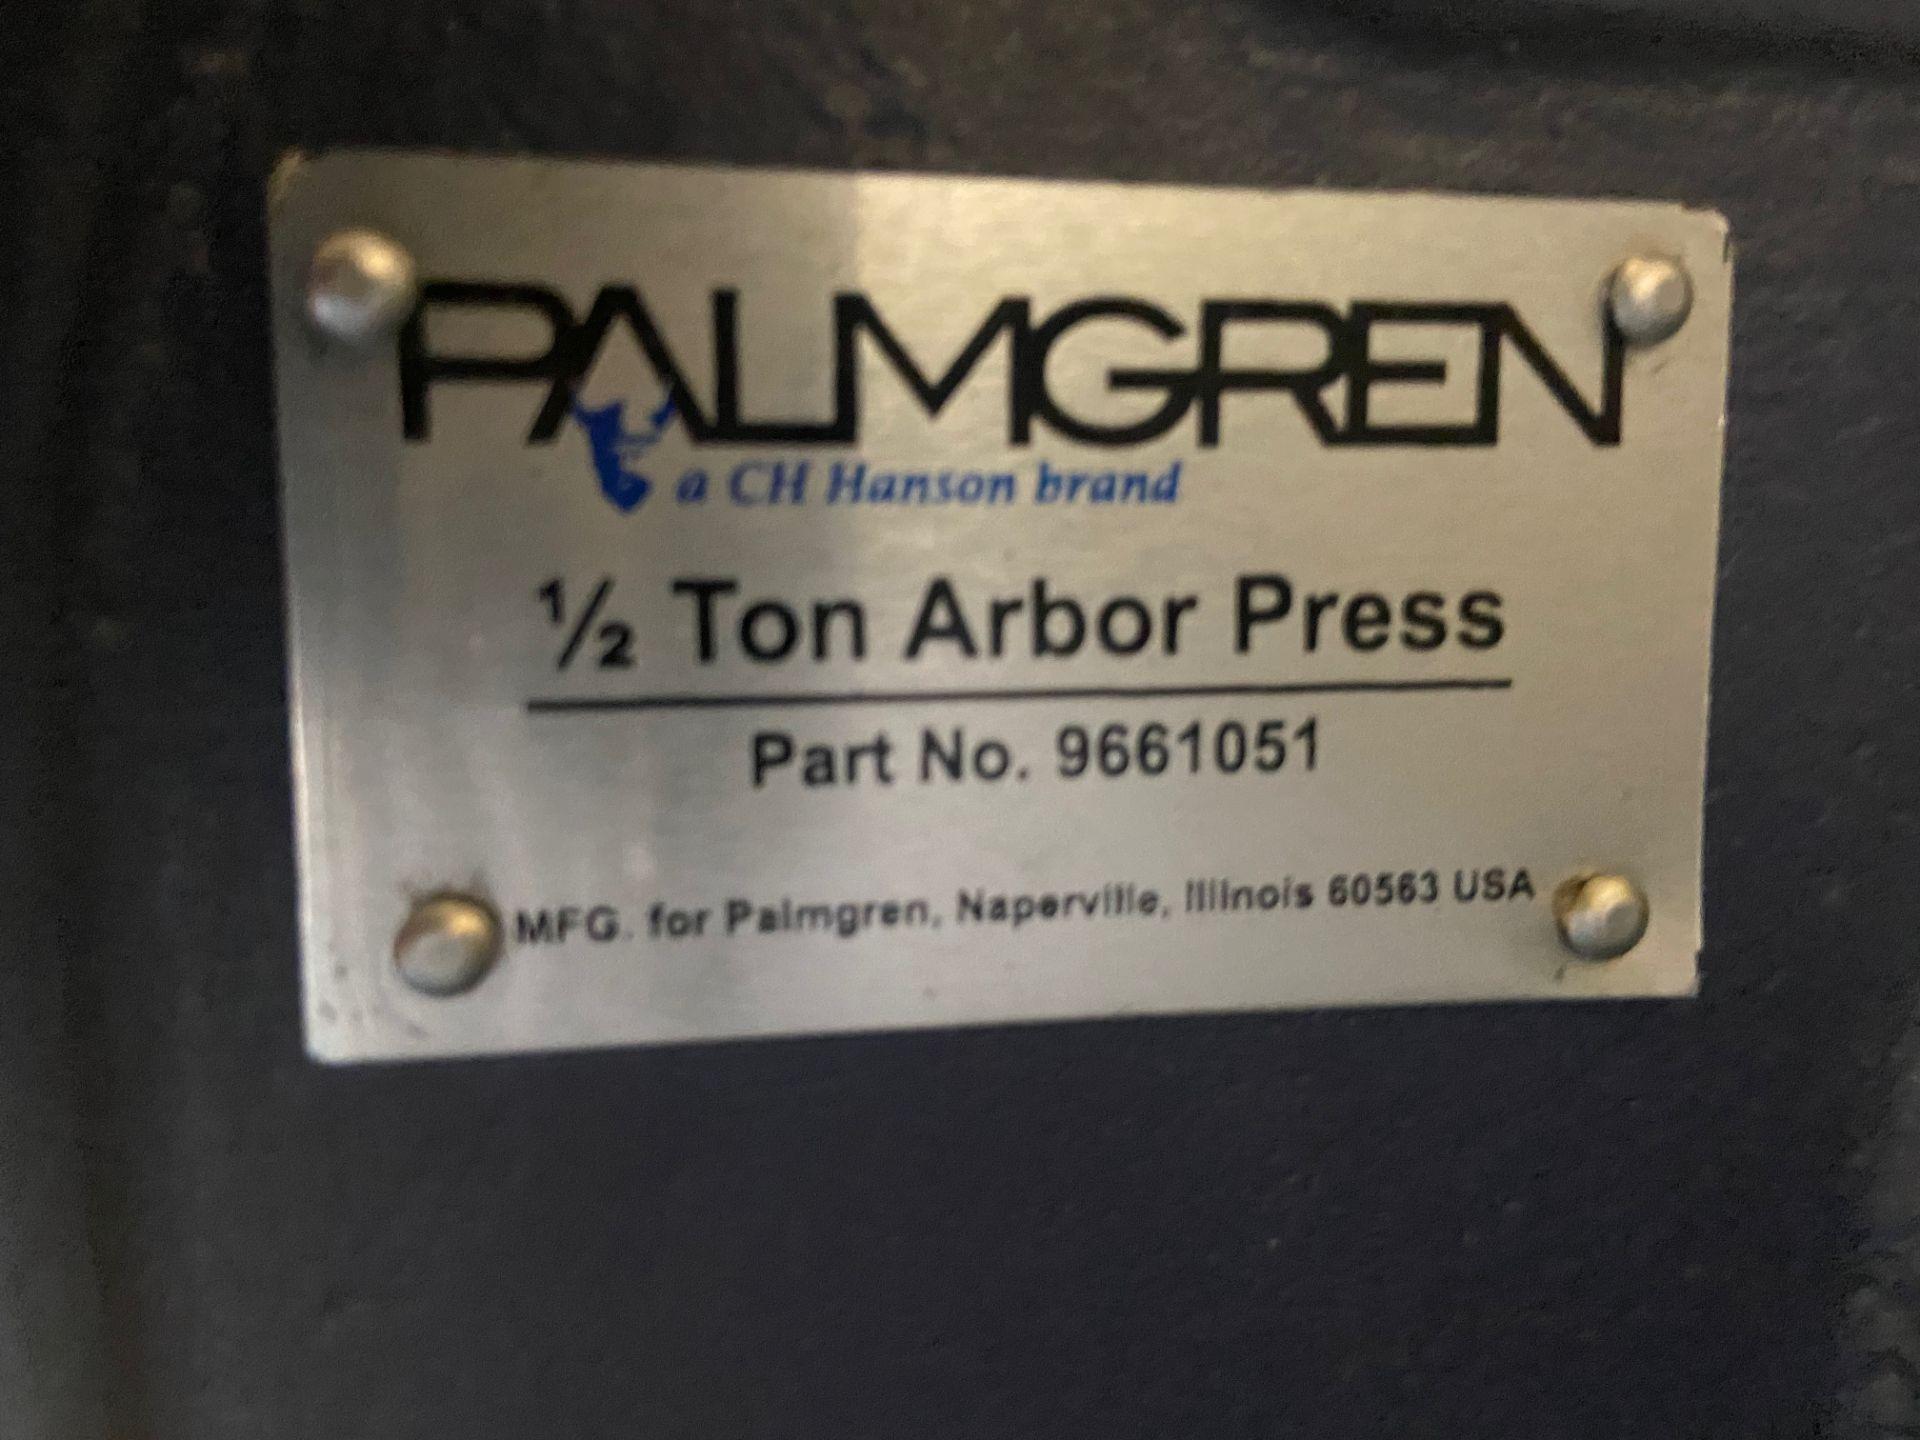 Palmgren 1/2 Ton Arbor Press, Rigging Fee: $20 - Image 3 of 5